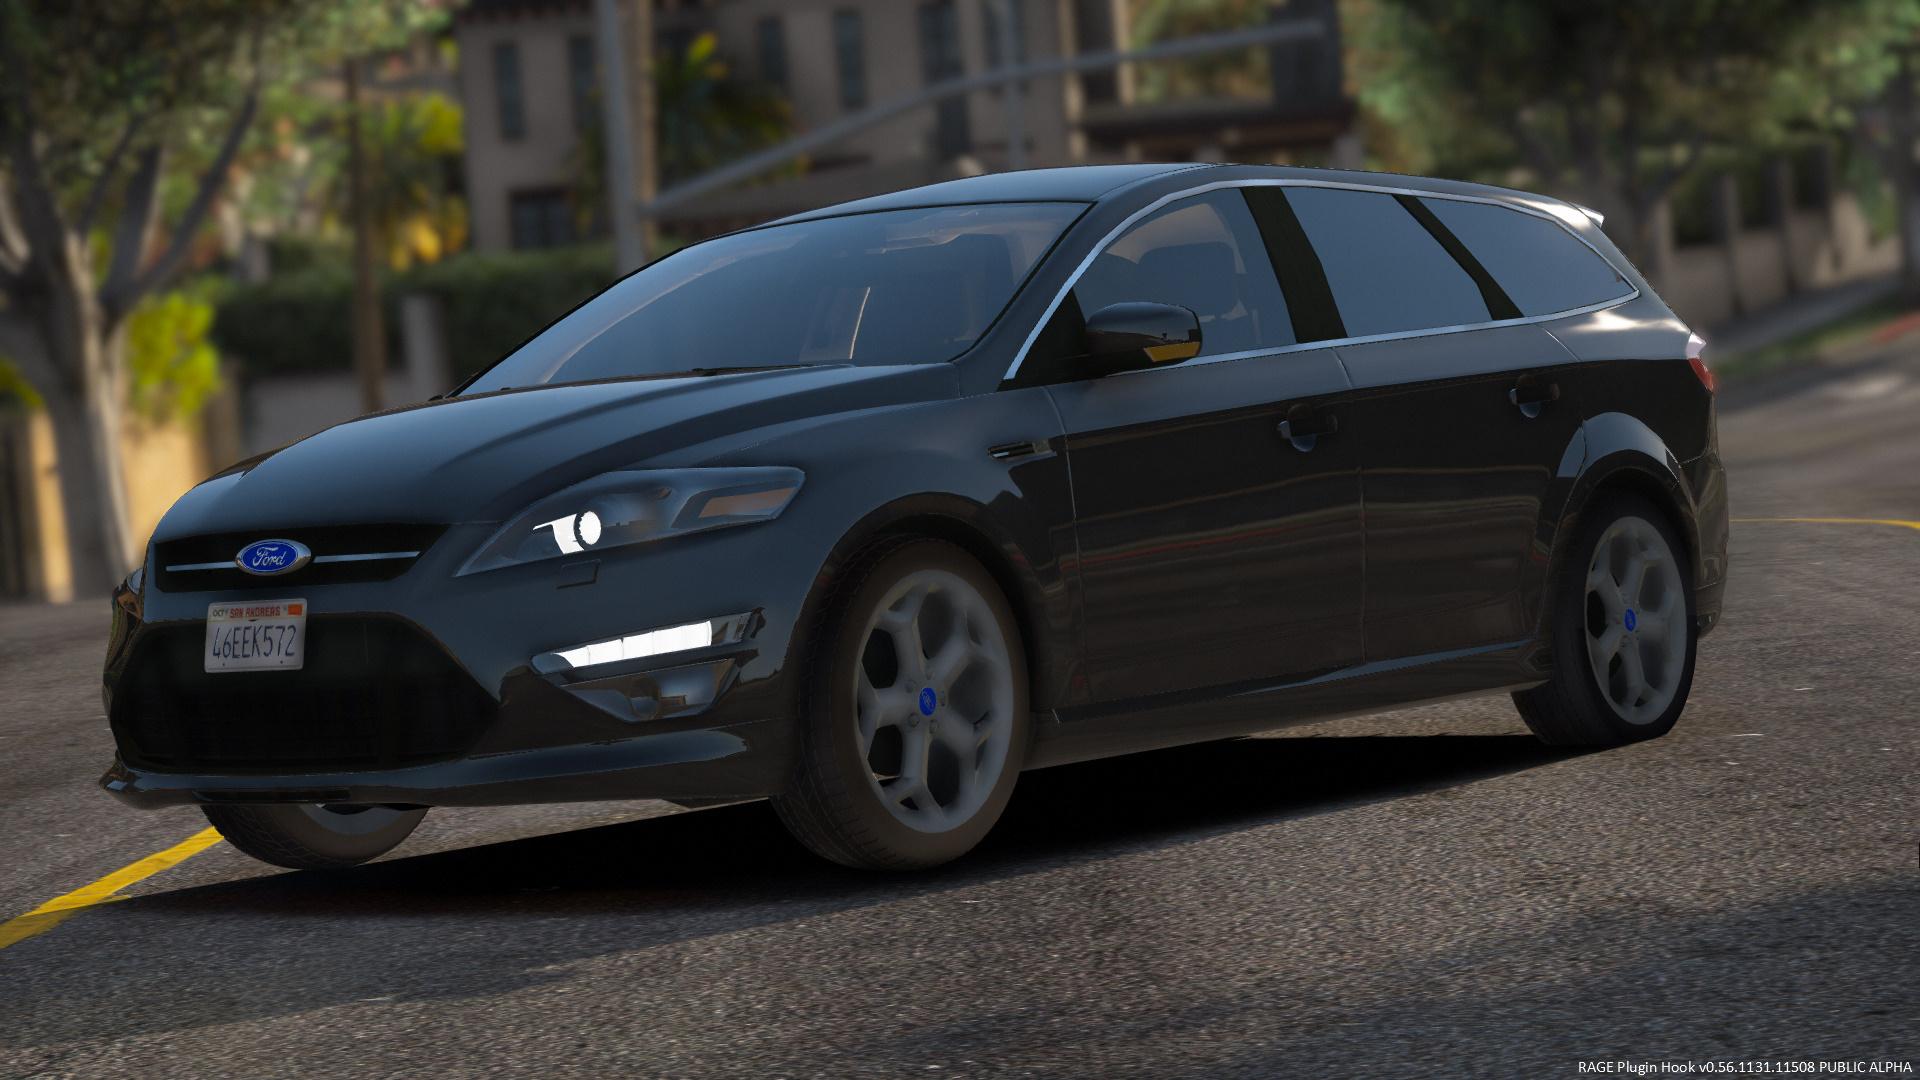 2012 ford mondeo mk4 titaniumx station wagon replace gta5. Black Bedroom Furniture Sets. Home Design Ideas